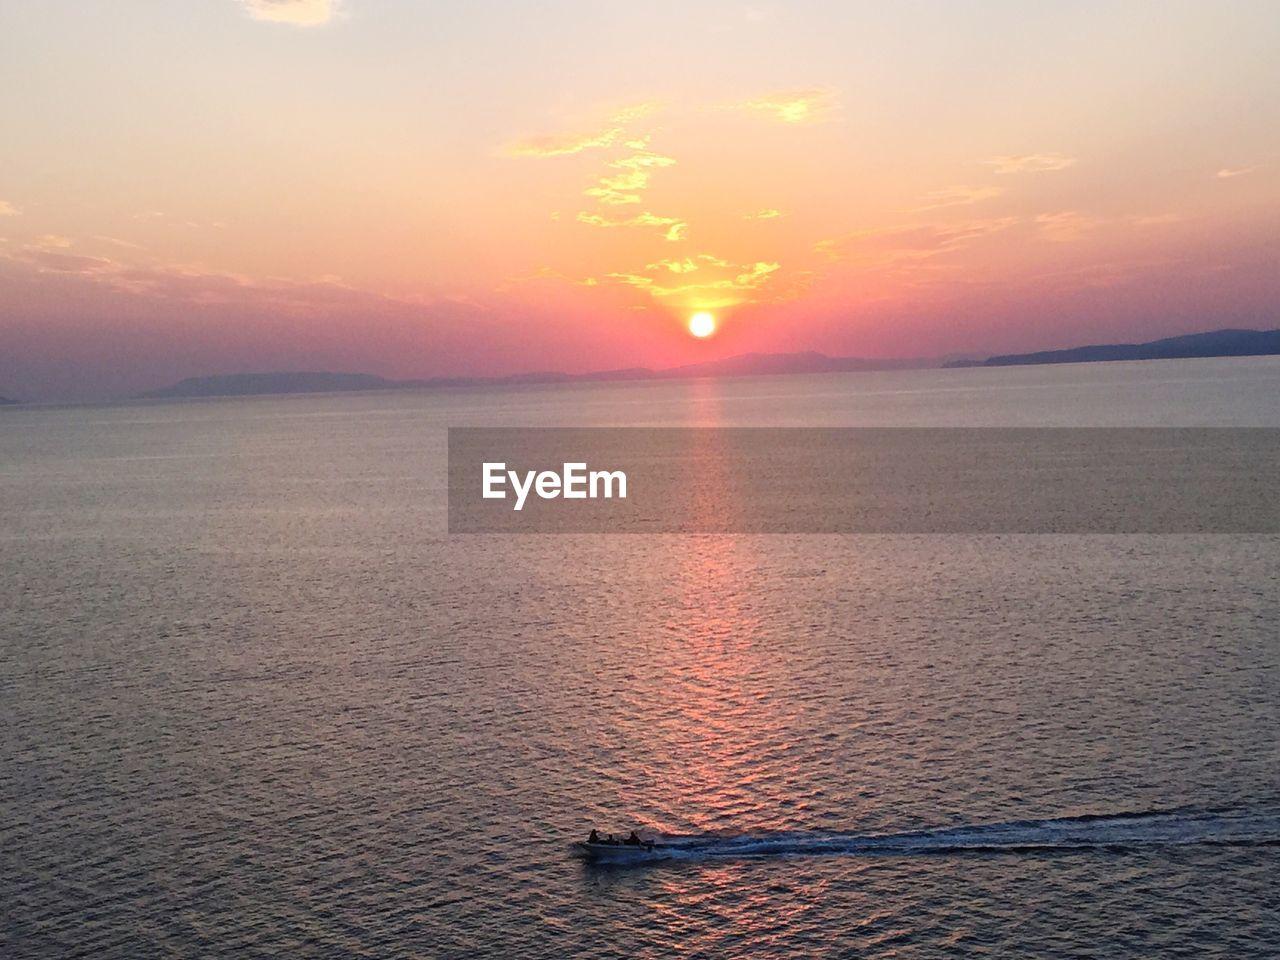 sunset, sky, scenics - nature, water, beauty in nature, tranquility, tranquil scene, orange color, sea, sun, cloud - sky, idyllic, waterfront, nautical vessel, nature, no people, non-urban scene, sunlight, horizon, horizon over water, outdoors